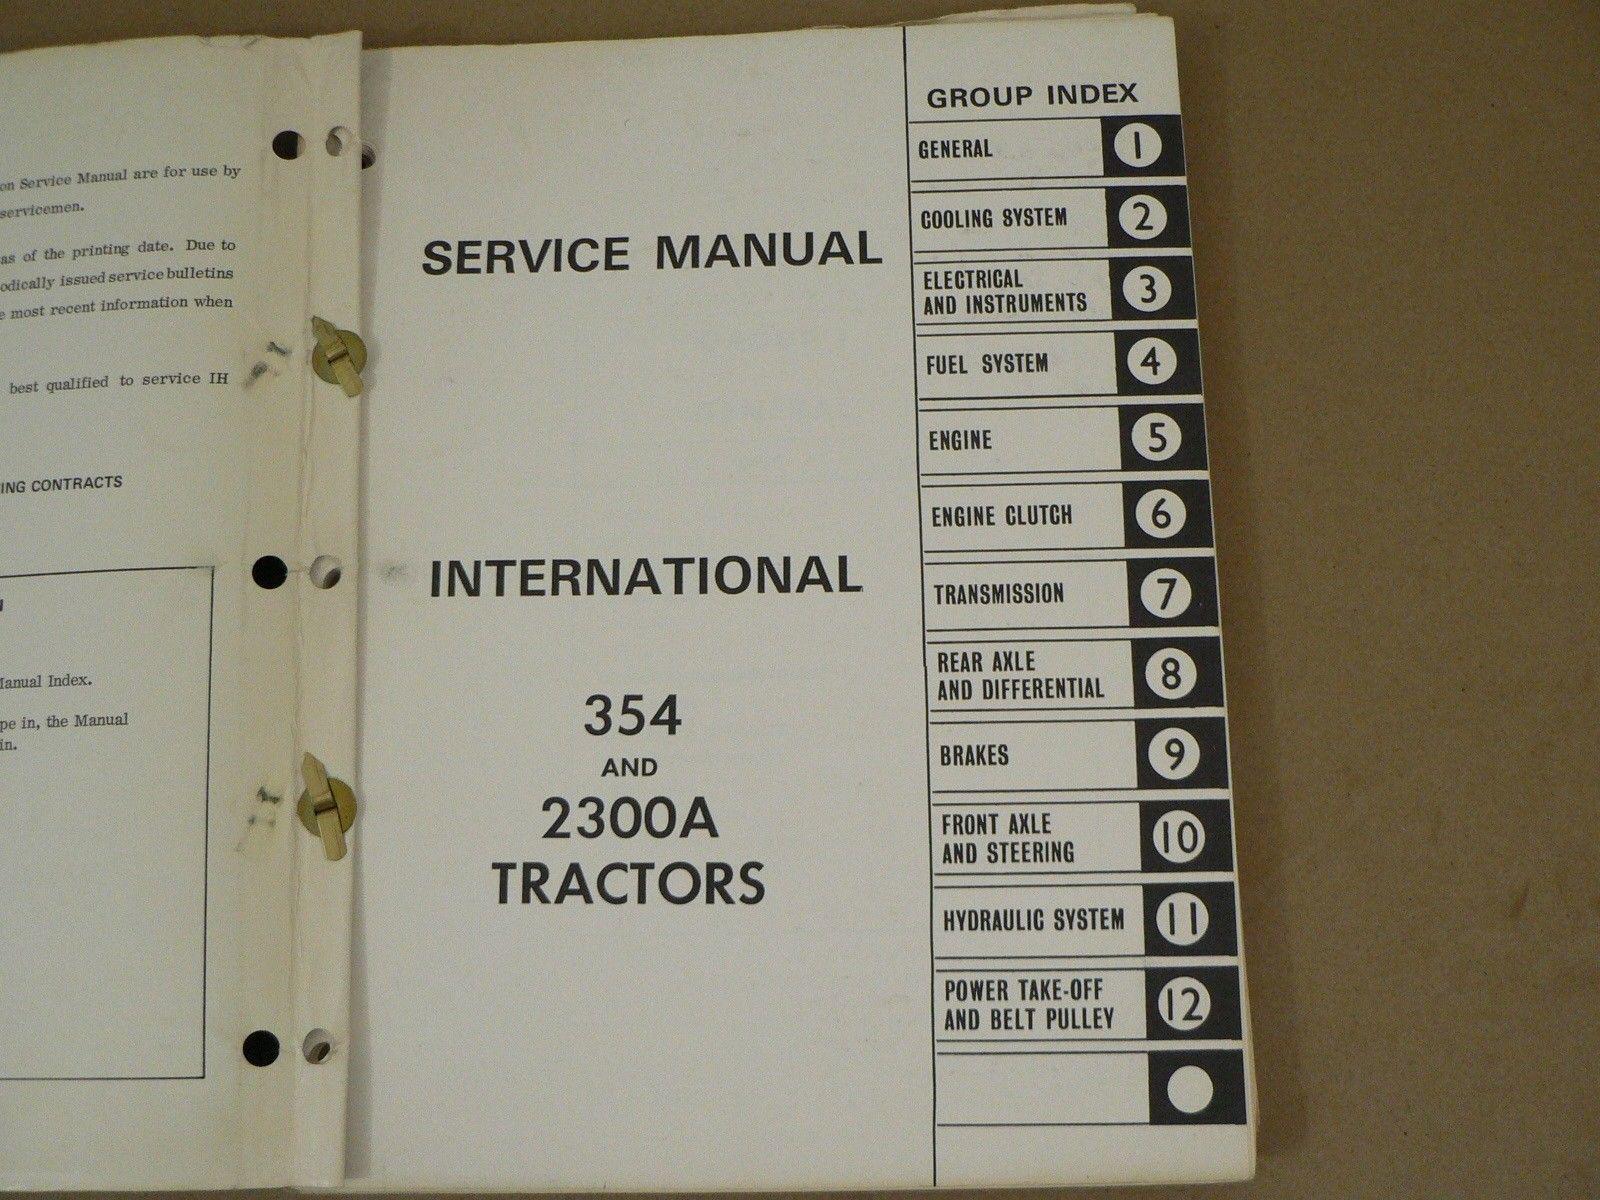 International Harvester Service Manual IH-S-354,2300A Tractors ...